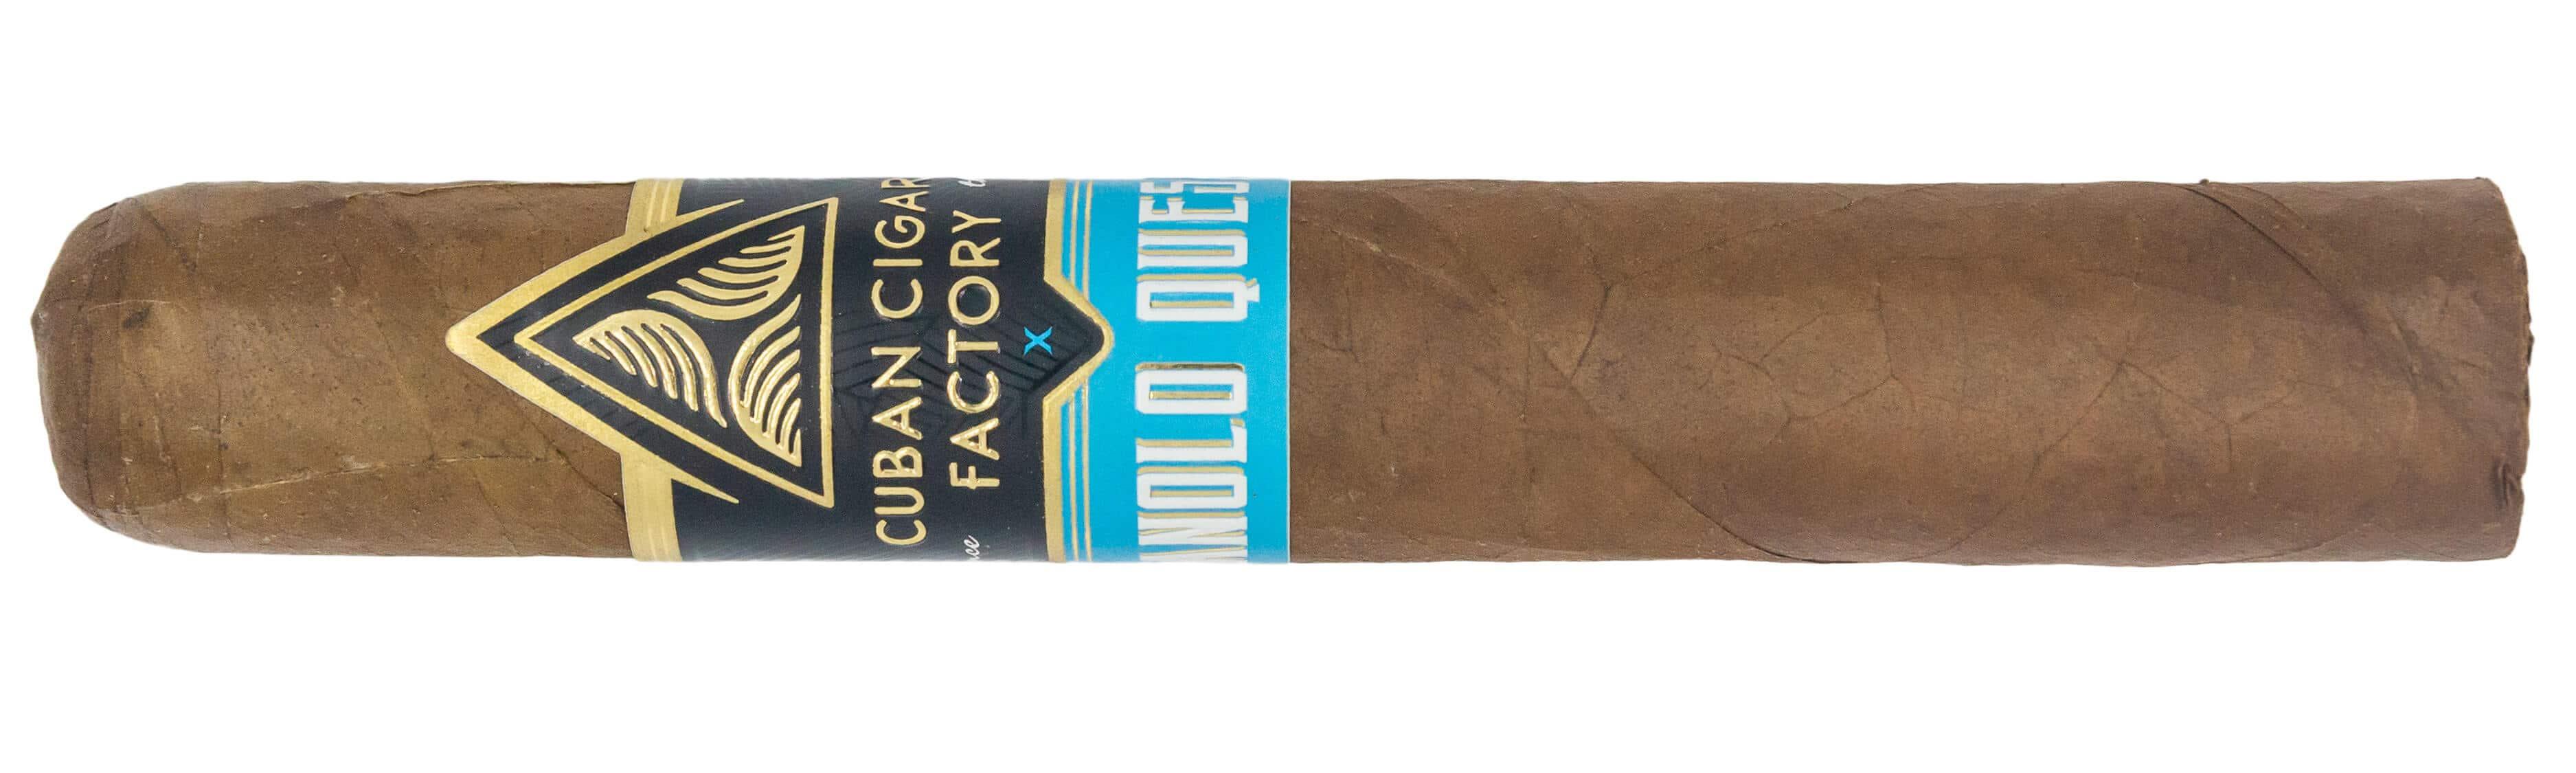 Blind Cigar Review: Ventura   Manolo Quesada for Cuban Cigar Factory Robusto